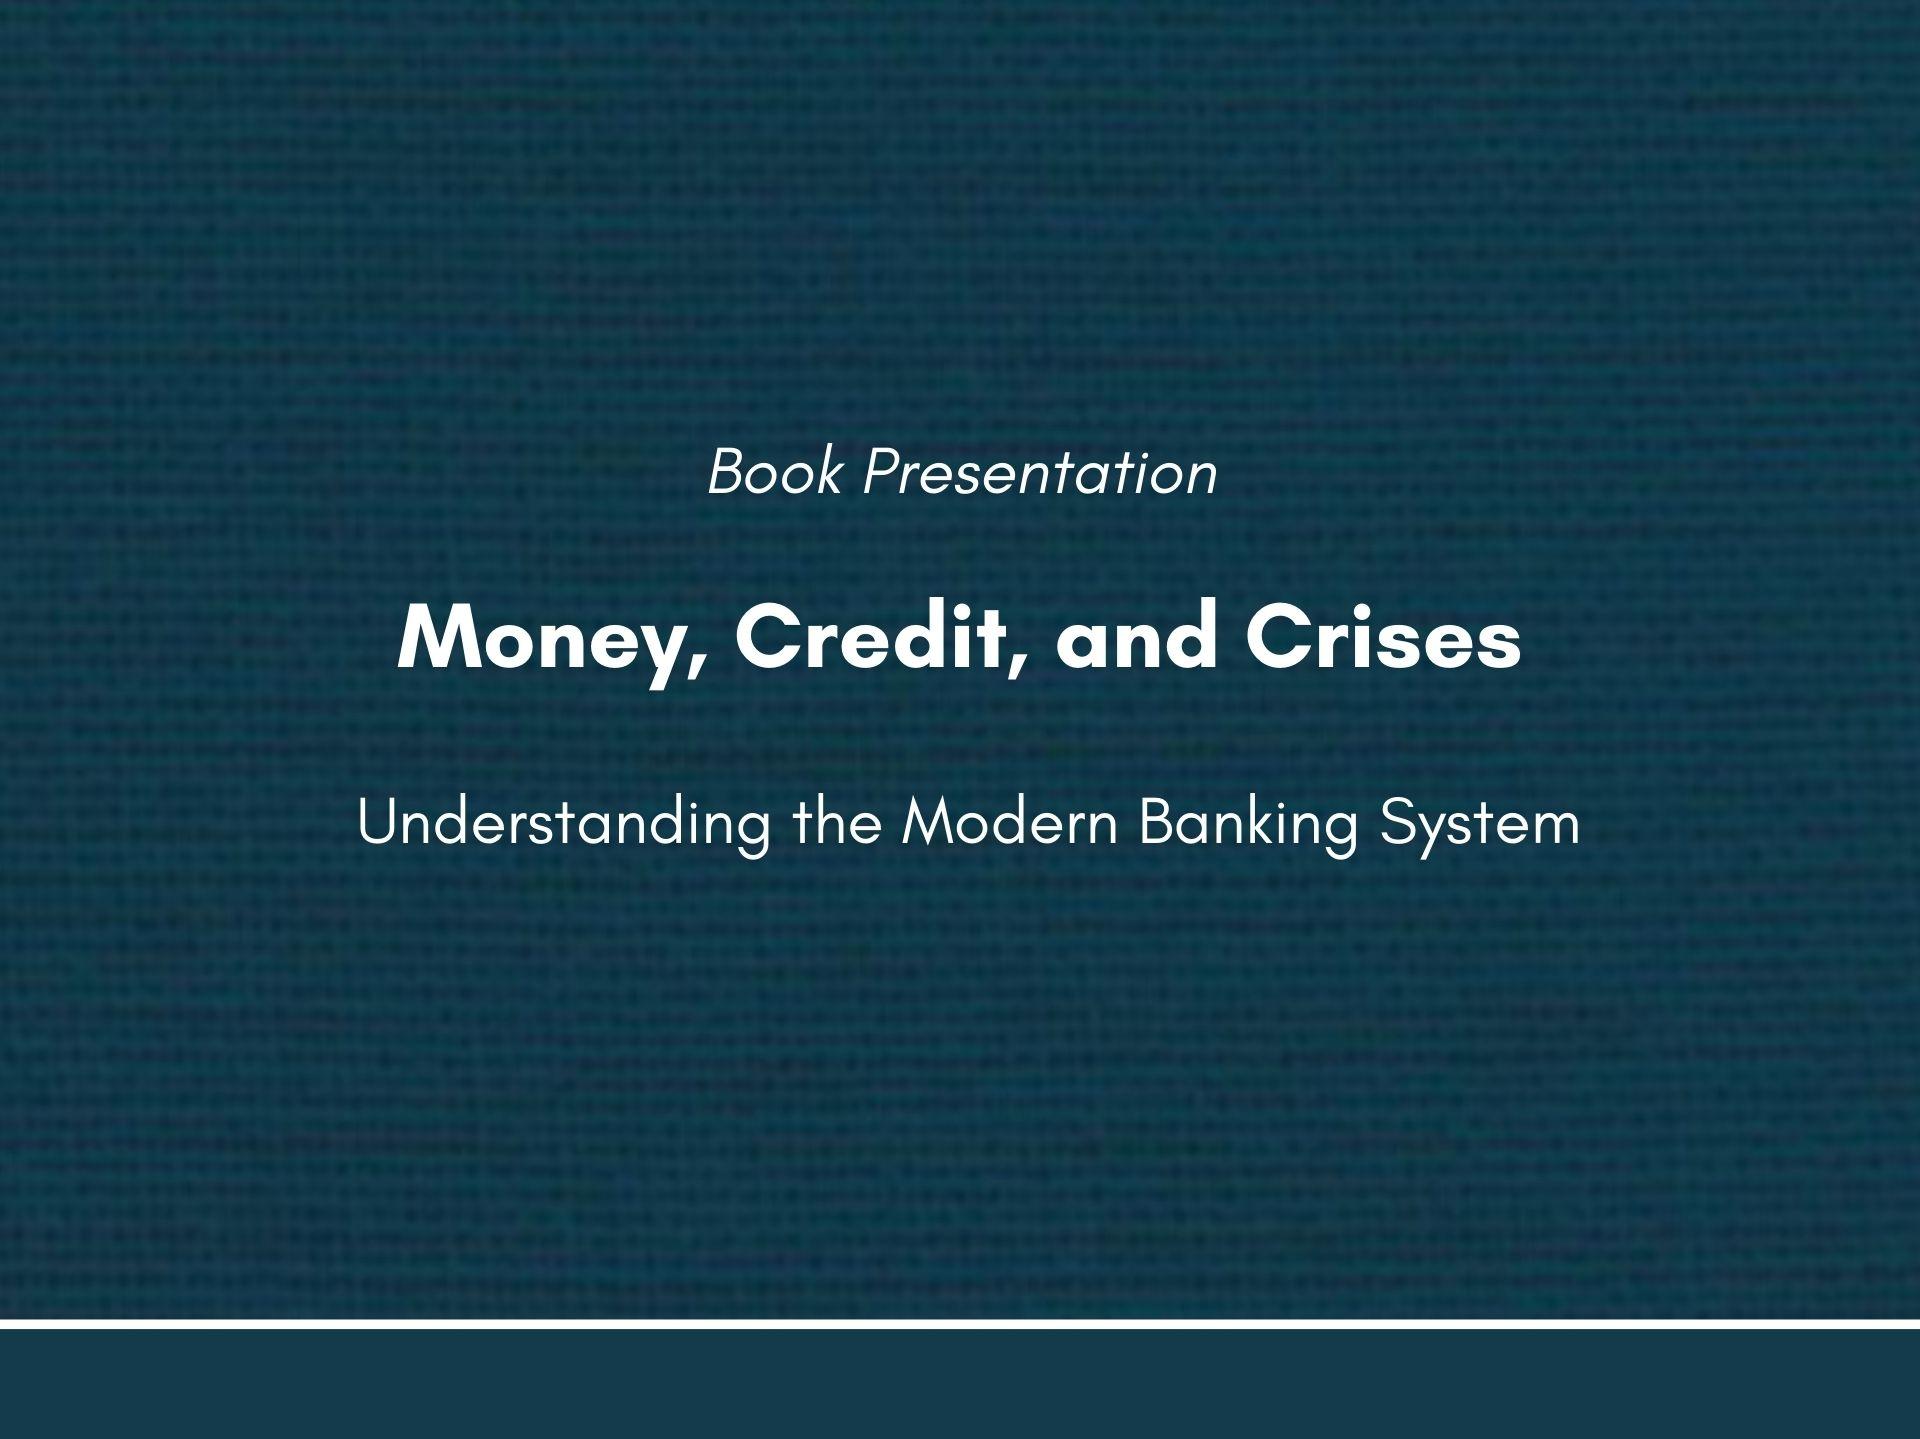 Money, Credit, and Crises